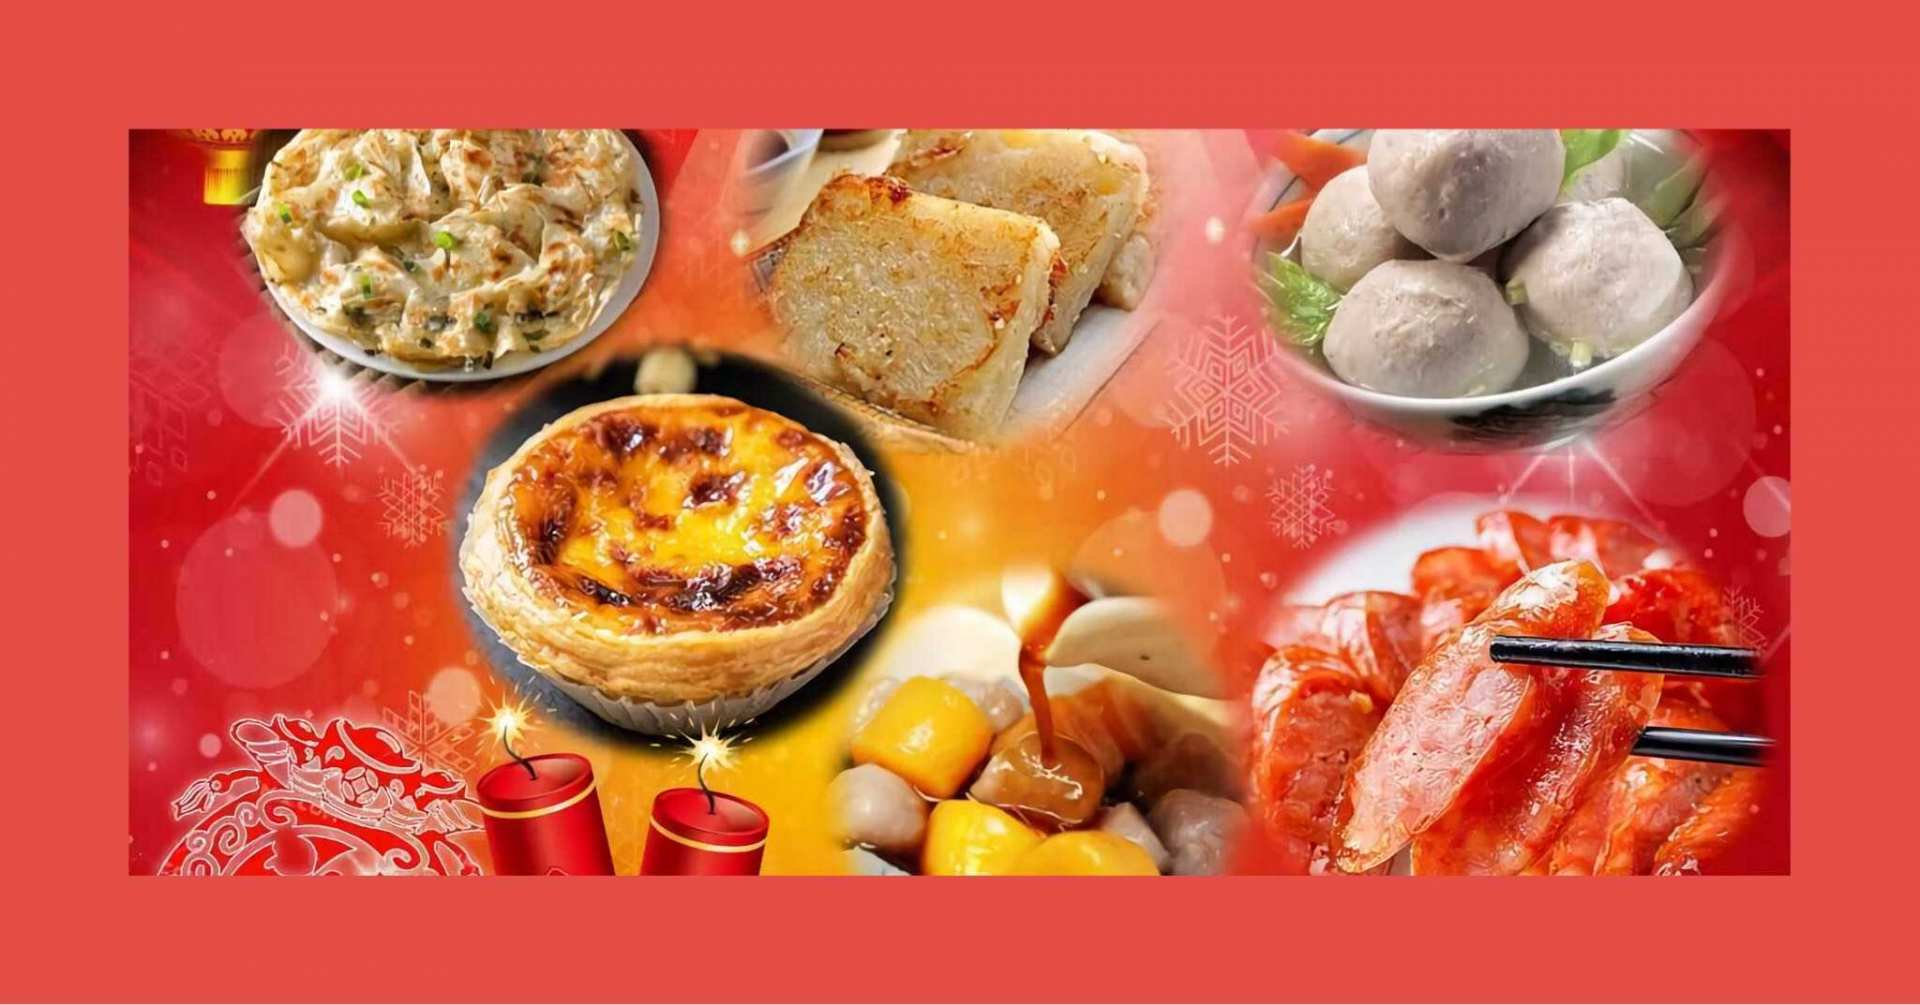 【NEW福袋】おうちで台湾|本場台湾の味|KKday限定台湾朝食セット_大根餅・葱パイ・卵クレープ|日本配送|送料込み